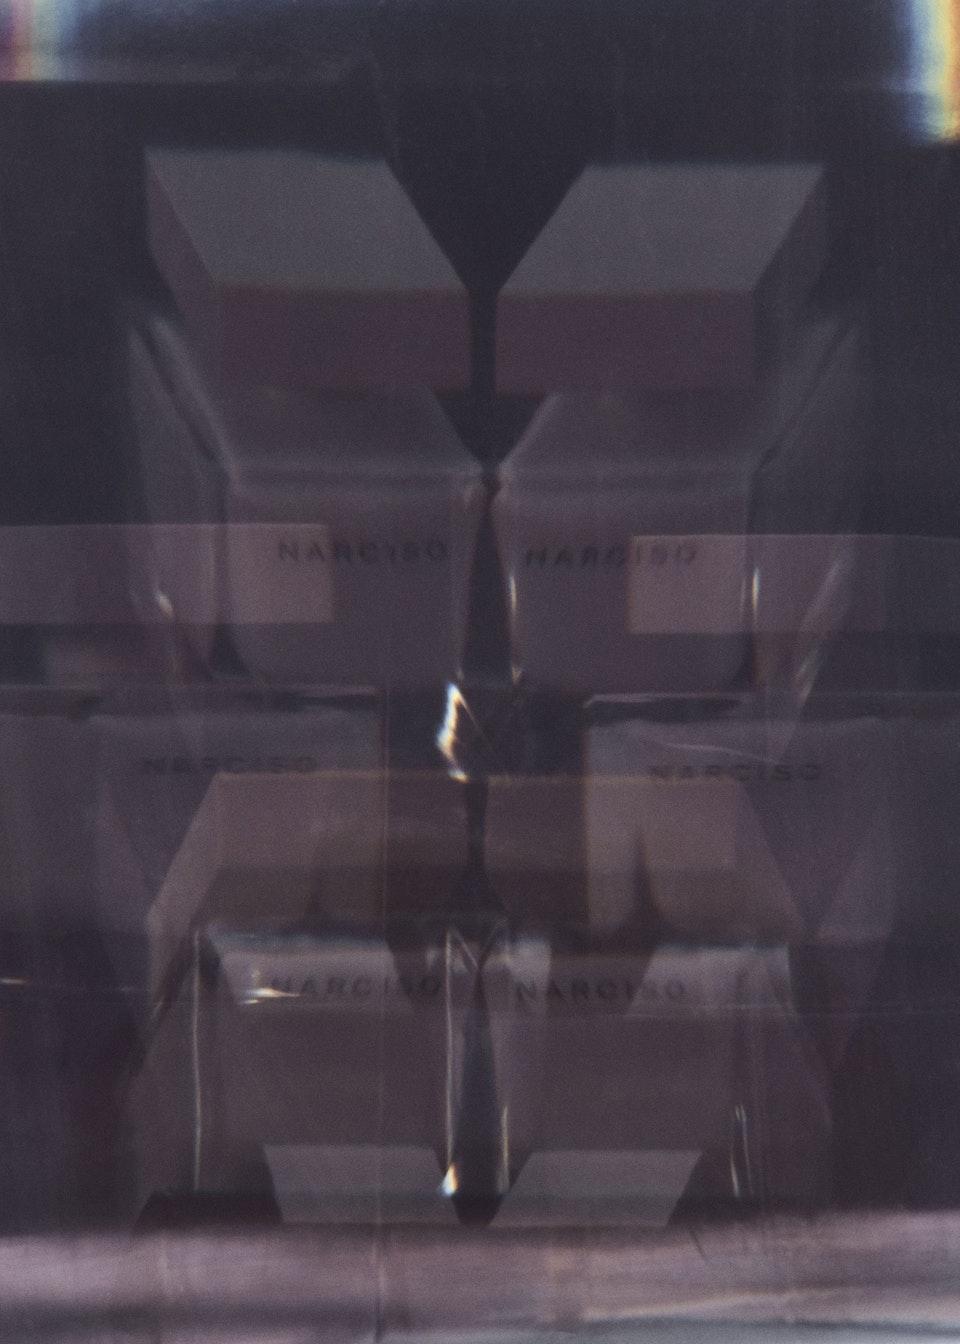 Narciso Rodriguez Perfume - Stills BLOOM_NARCISO_PARFUM_3